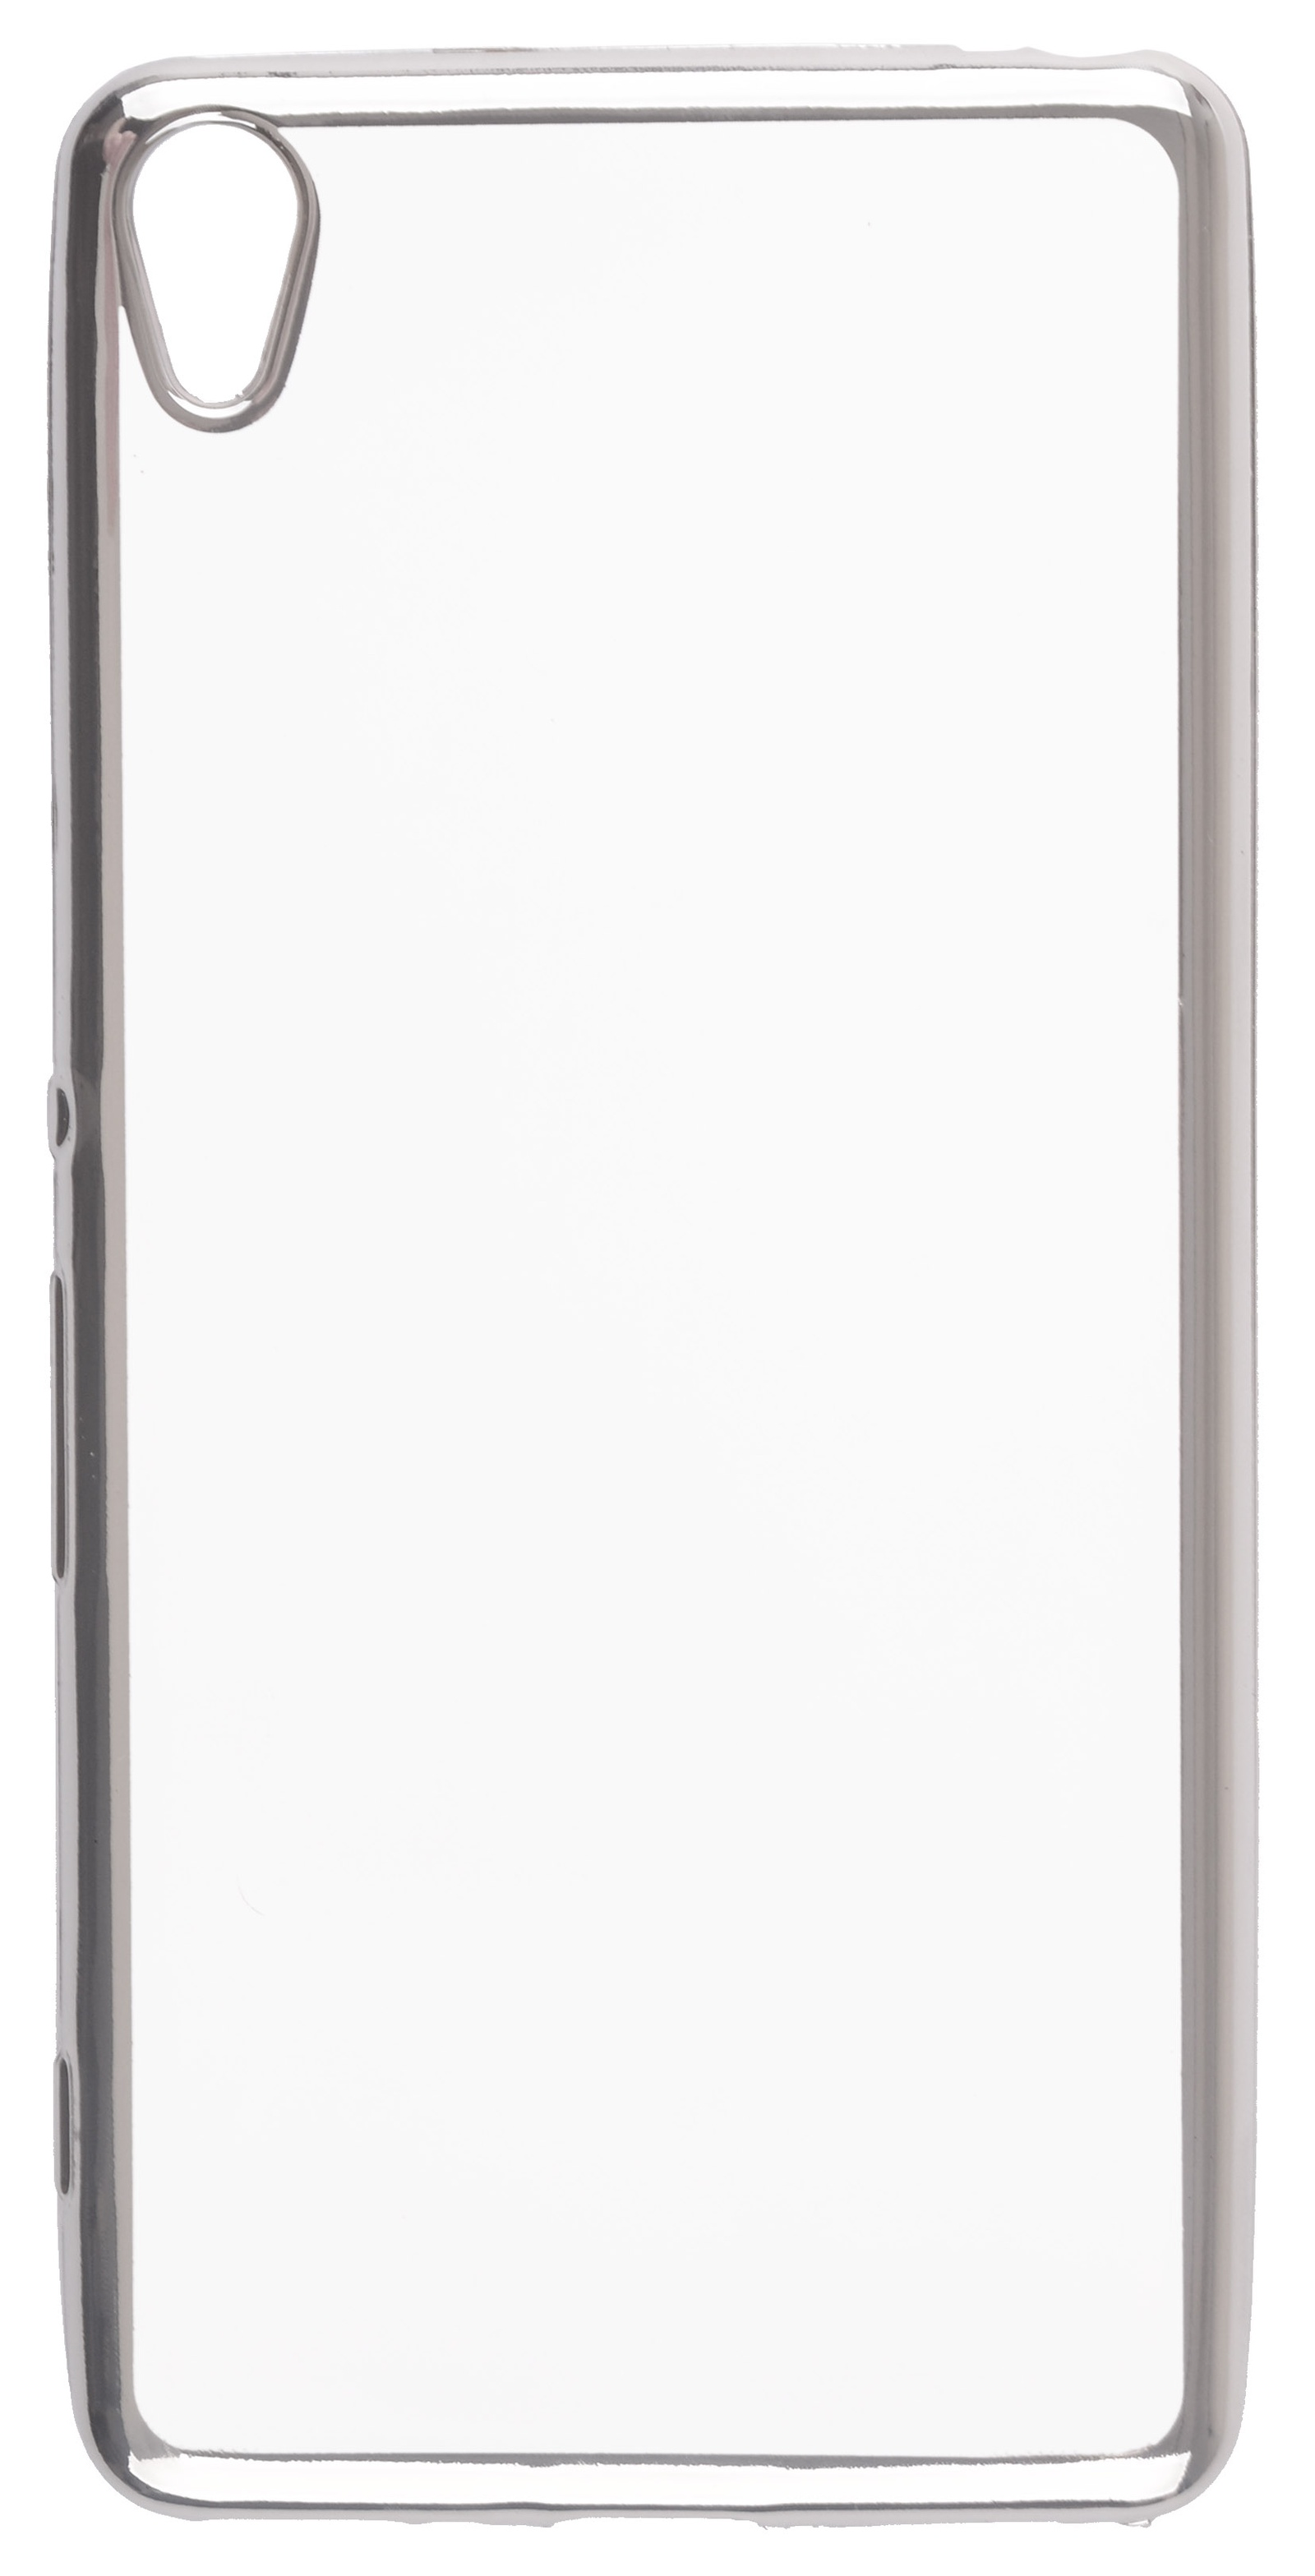 Чехол для сотового телефона skinBOX Silicone chrome border, 4630042528741, серебристый чехол для сотового телефона skinbox silicone chrome border 4630042528697 серебристый